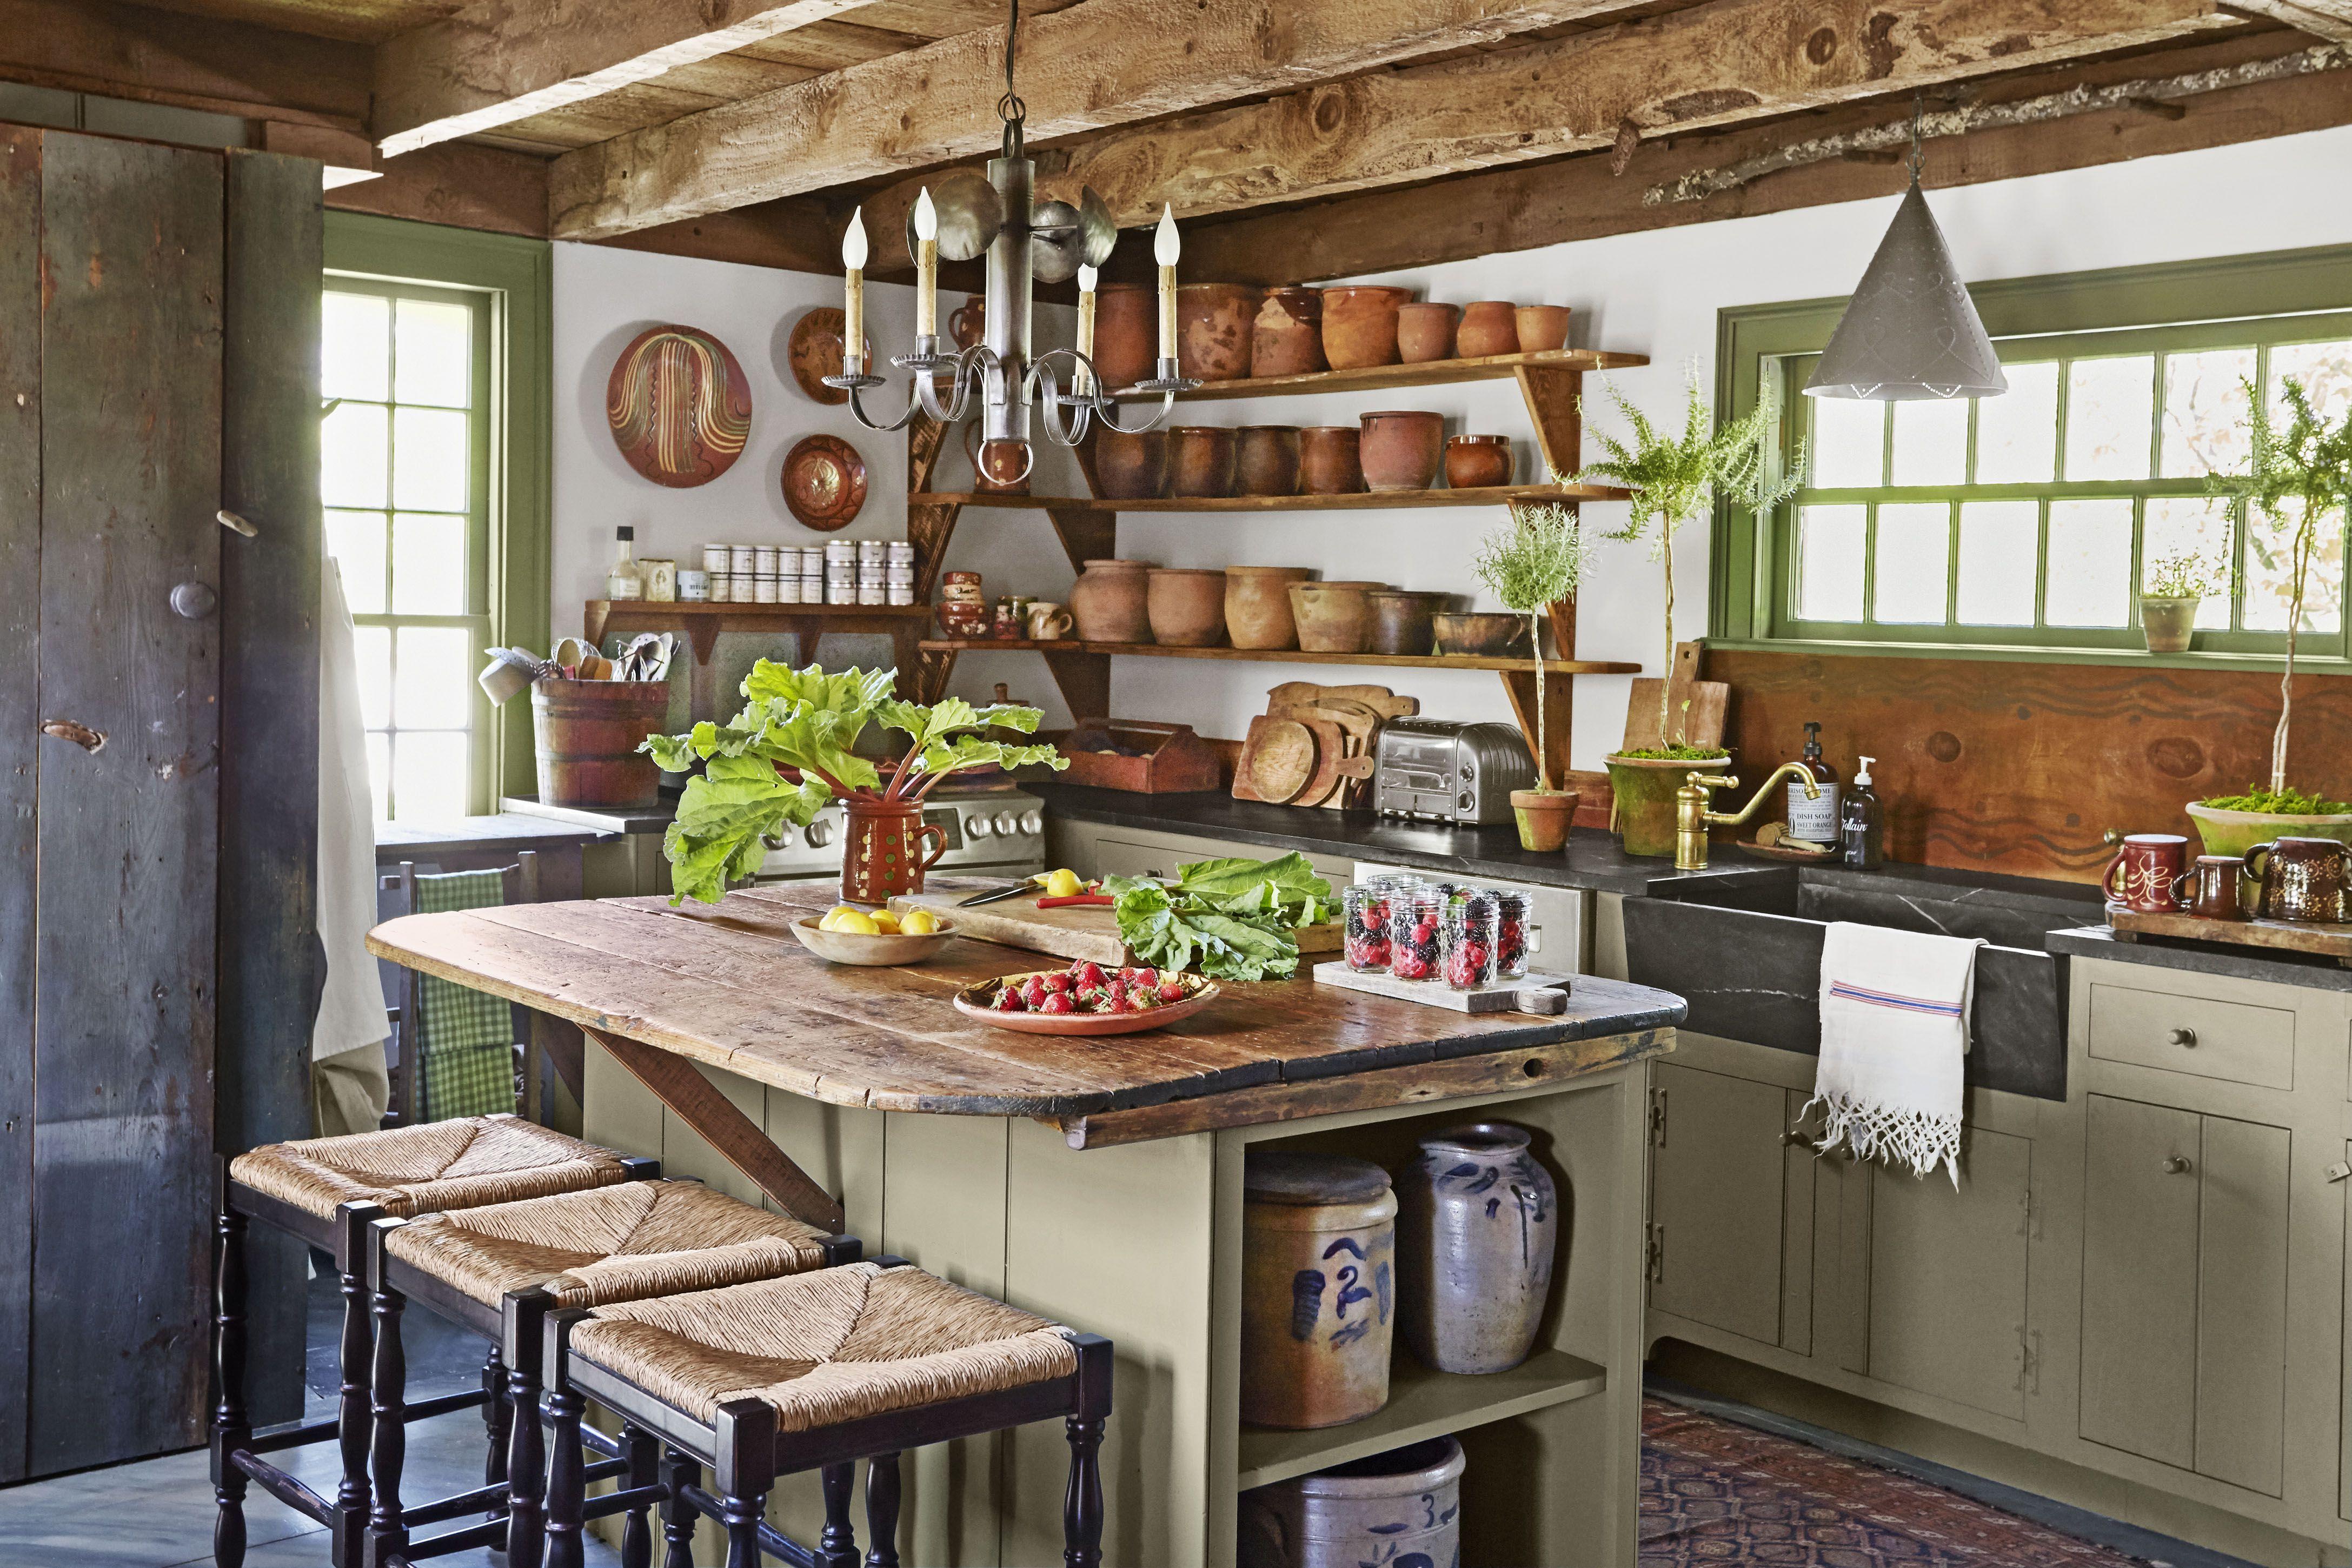 34 Farmhouse Style Kitchens   Rustic Decor Ideas for Kitchens 4350x2900